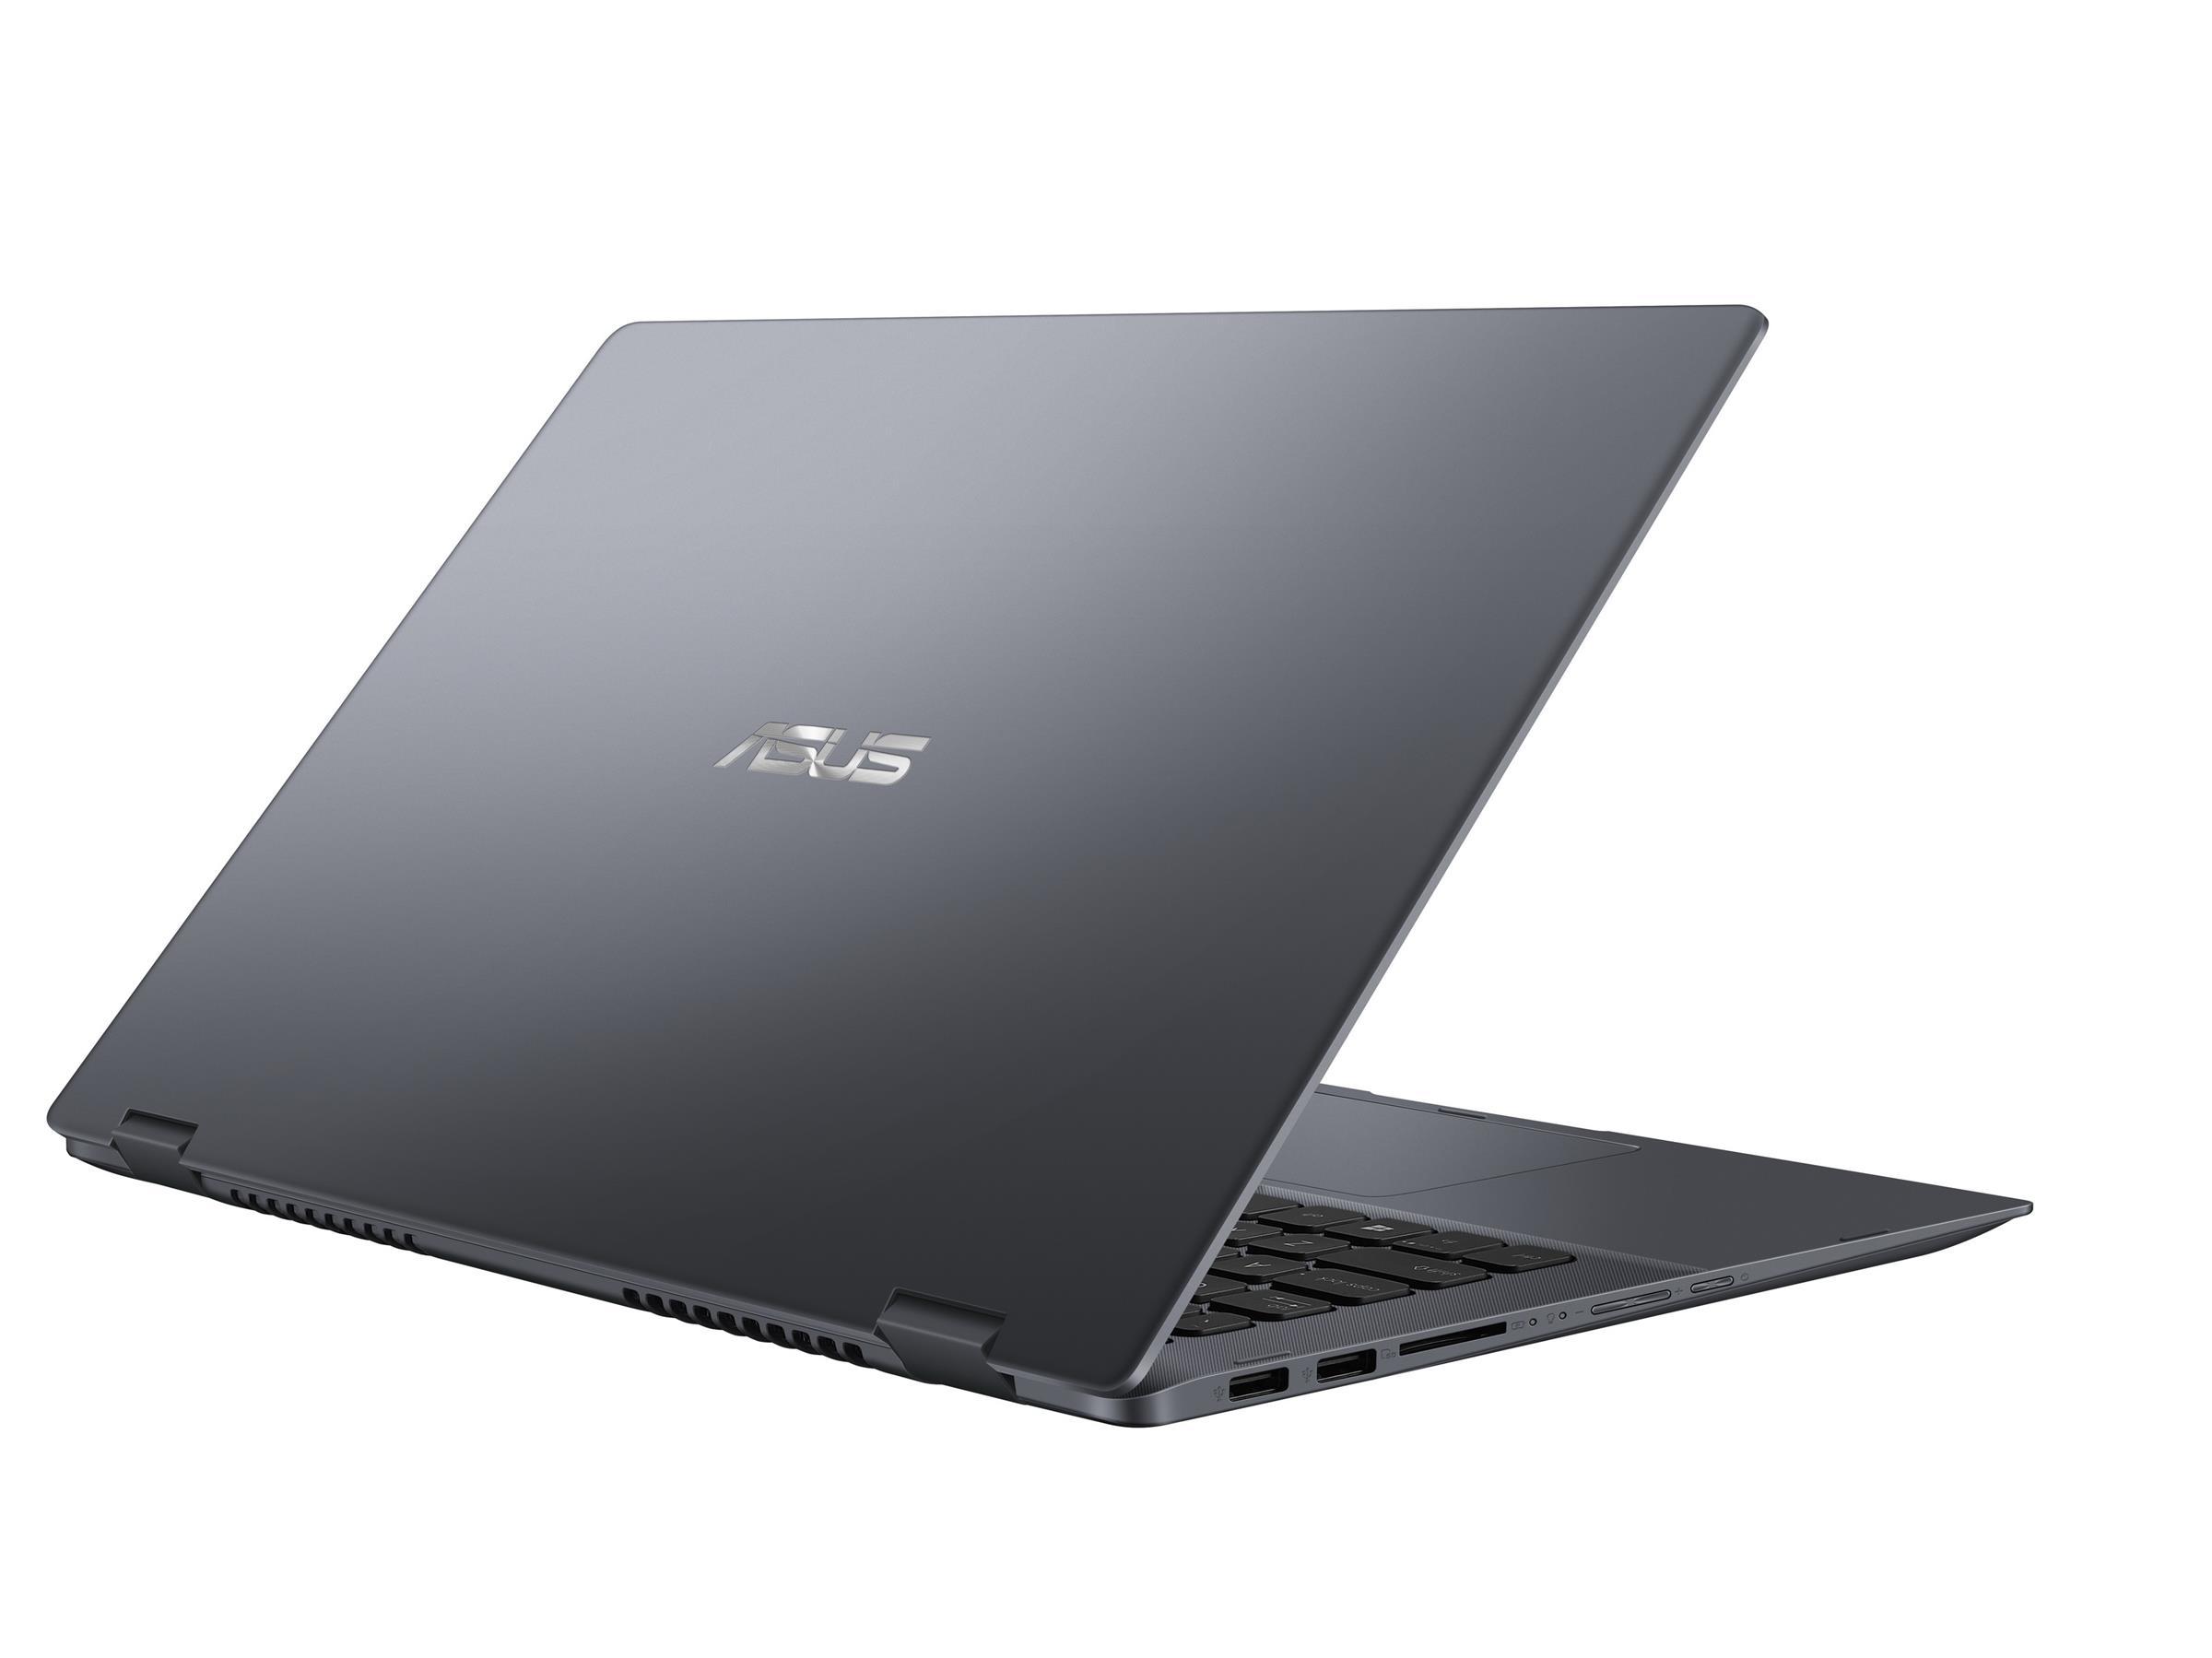 Prenosni računalnik FLIP TP412UA-EC141T FHD ASUS I3-7020/8G/256G/W10